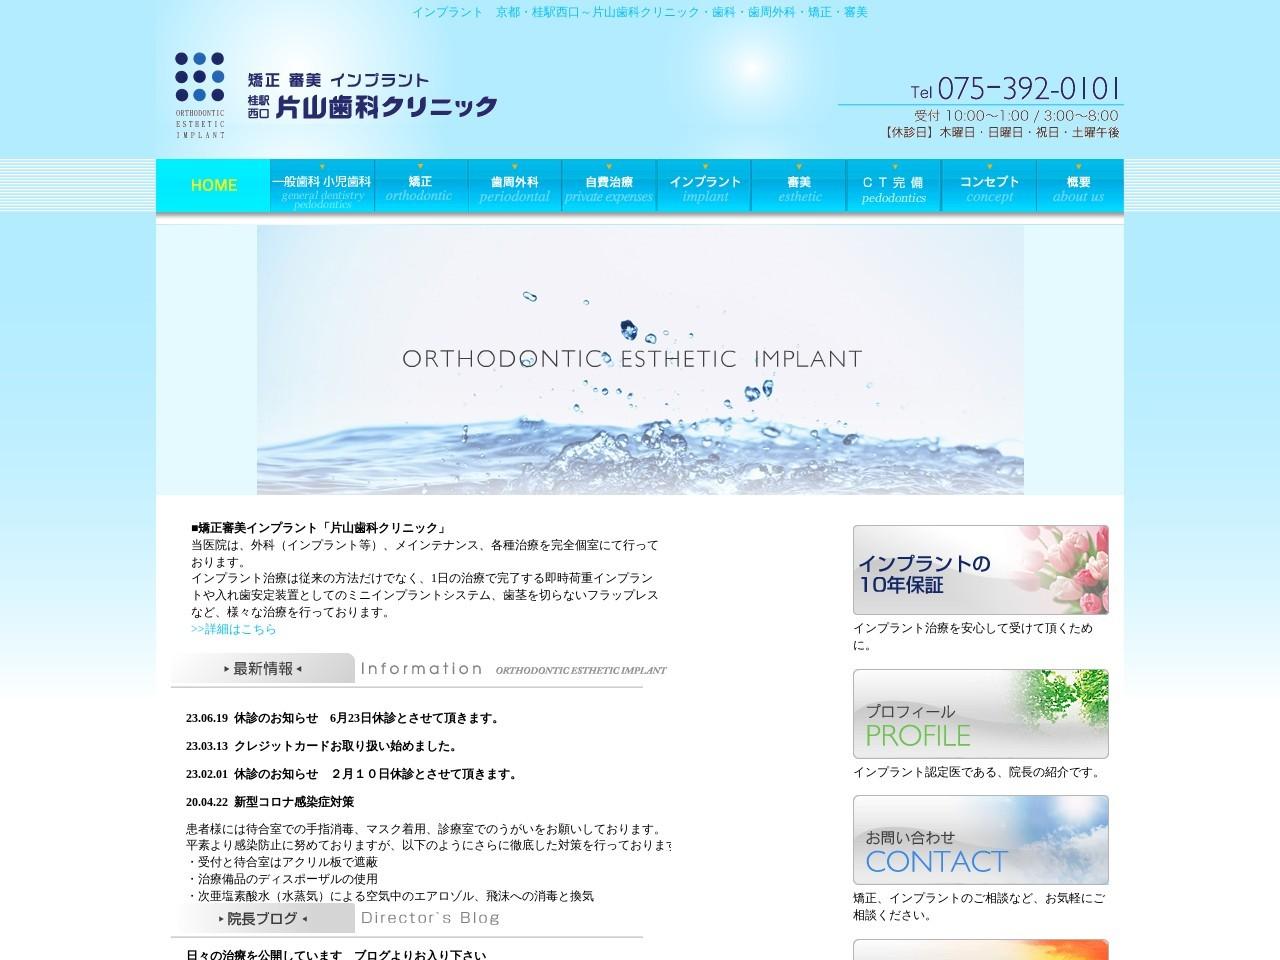 桂駅西口片山歯科クリニック (京都府京都市西京区)